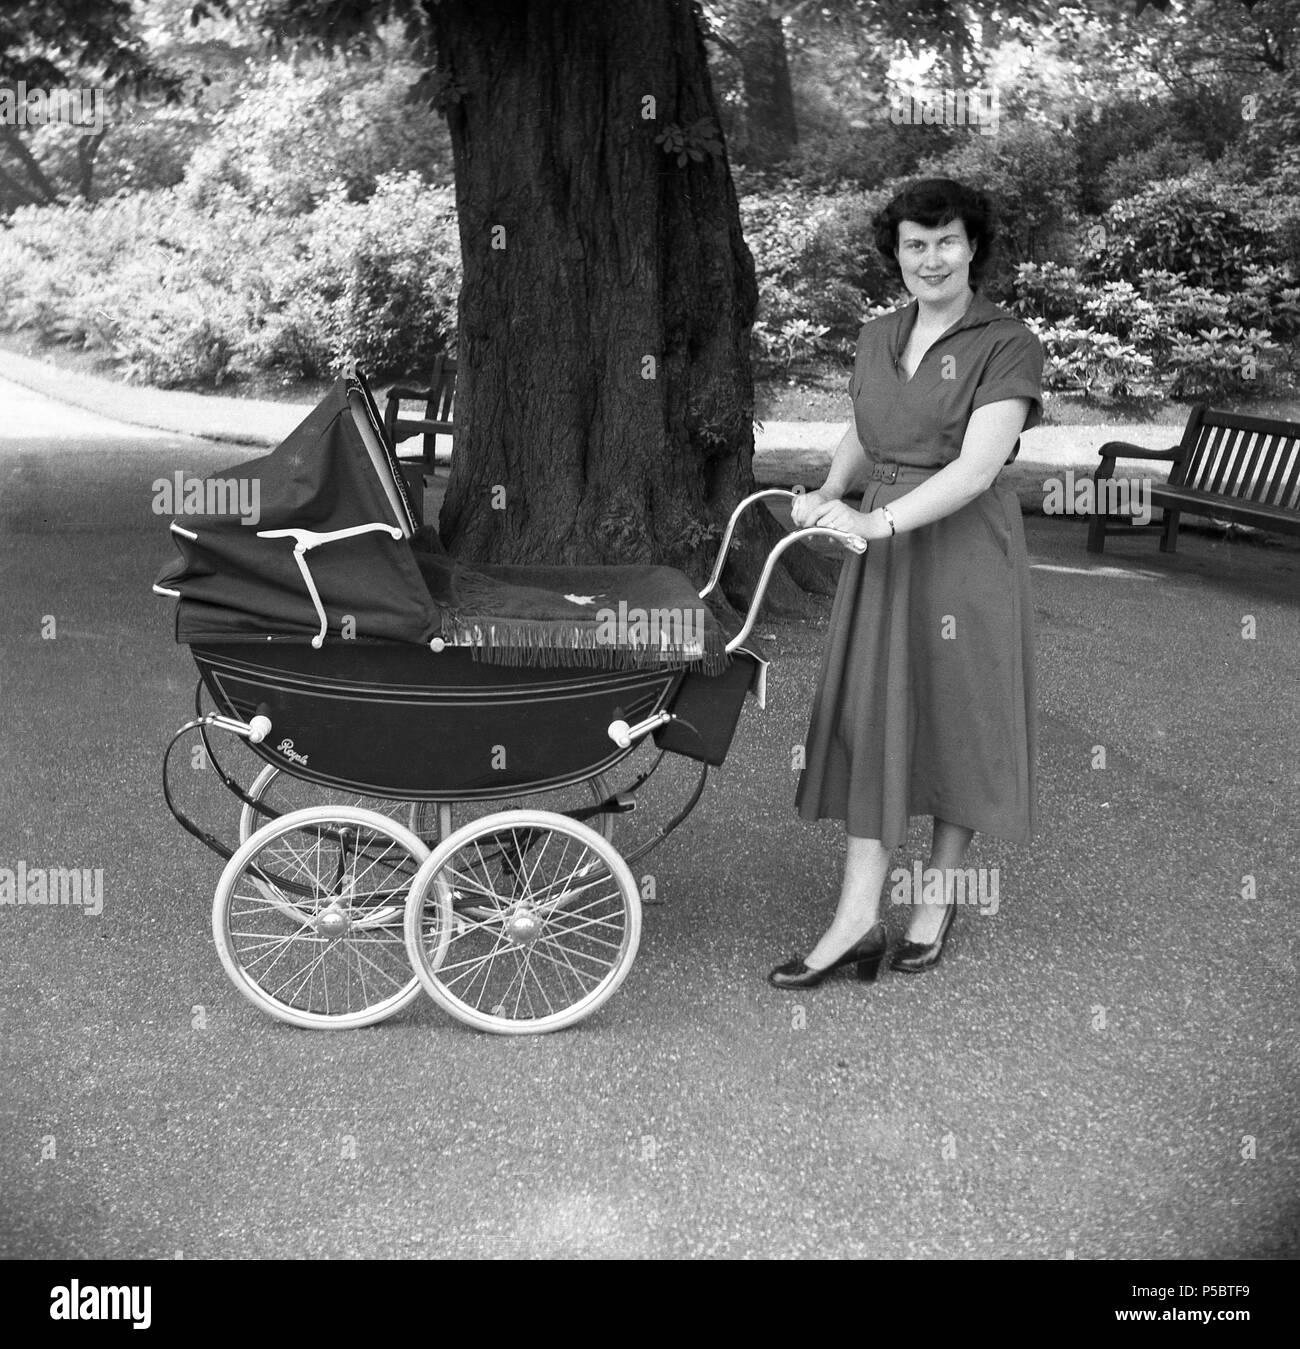 0eb07a5e9872 Baby Pram 1950s Stock Photos   Baby Pram 1950s Stock Images - Alamy